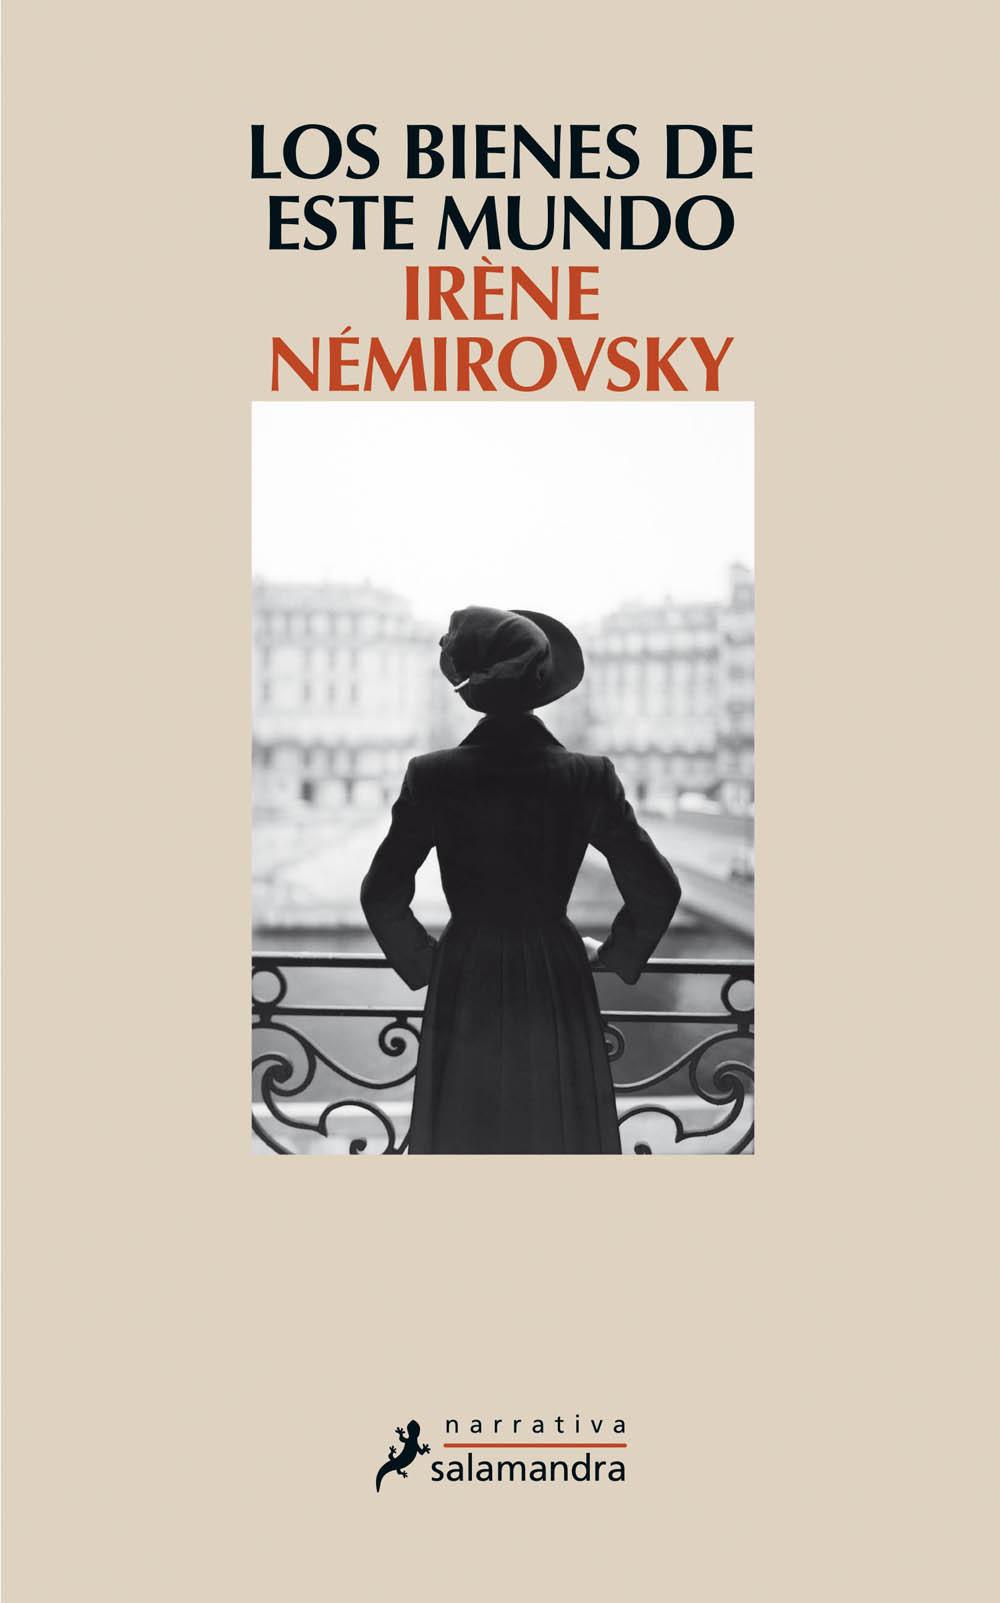 LOS BIENES DE ESTE MUNDO - Irène Nemirovsky